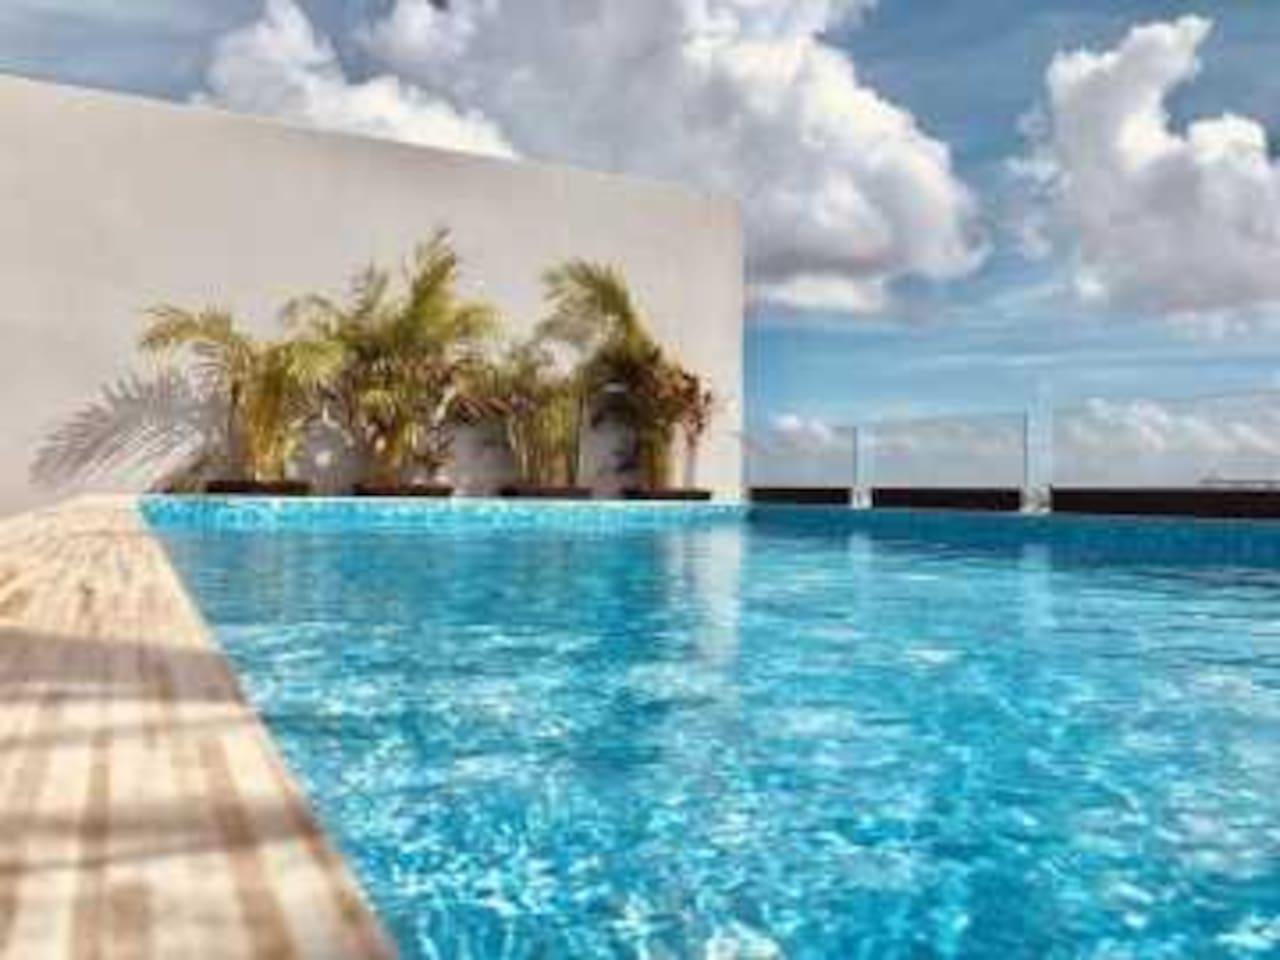 New Luxury Beach Condo 2 BD/2Bth Steps from Beach PDC safari 201 - a SkyRun Riviera Maya Property - outdoor pool